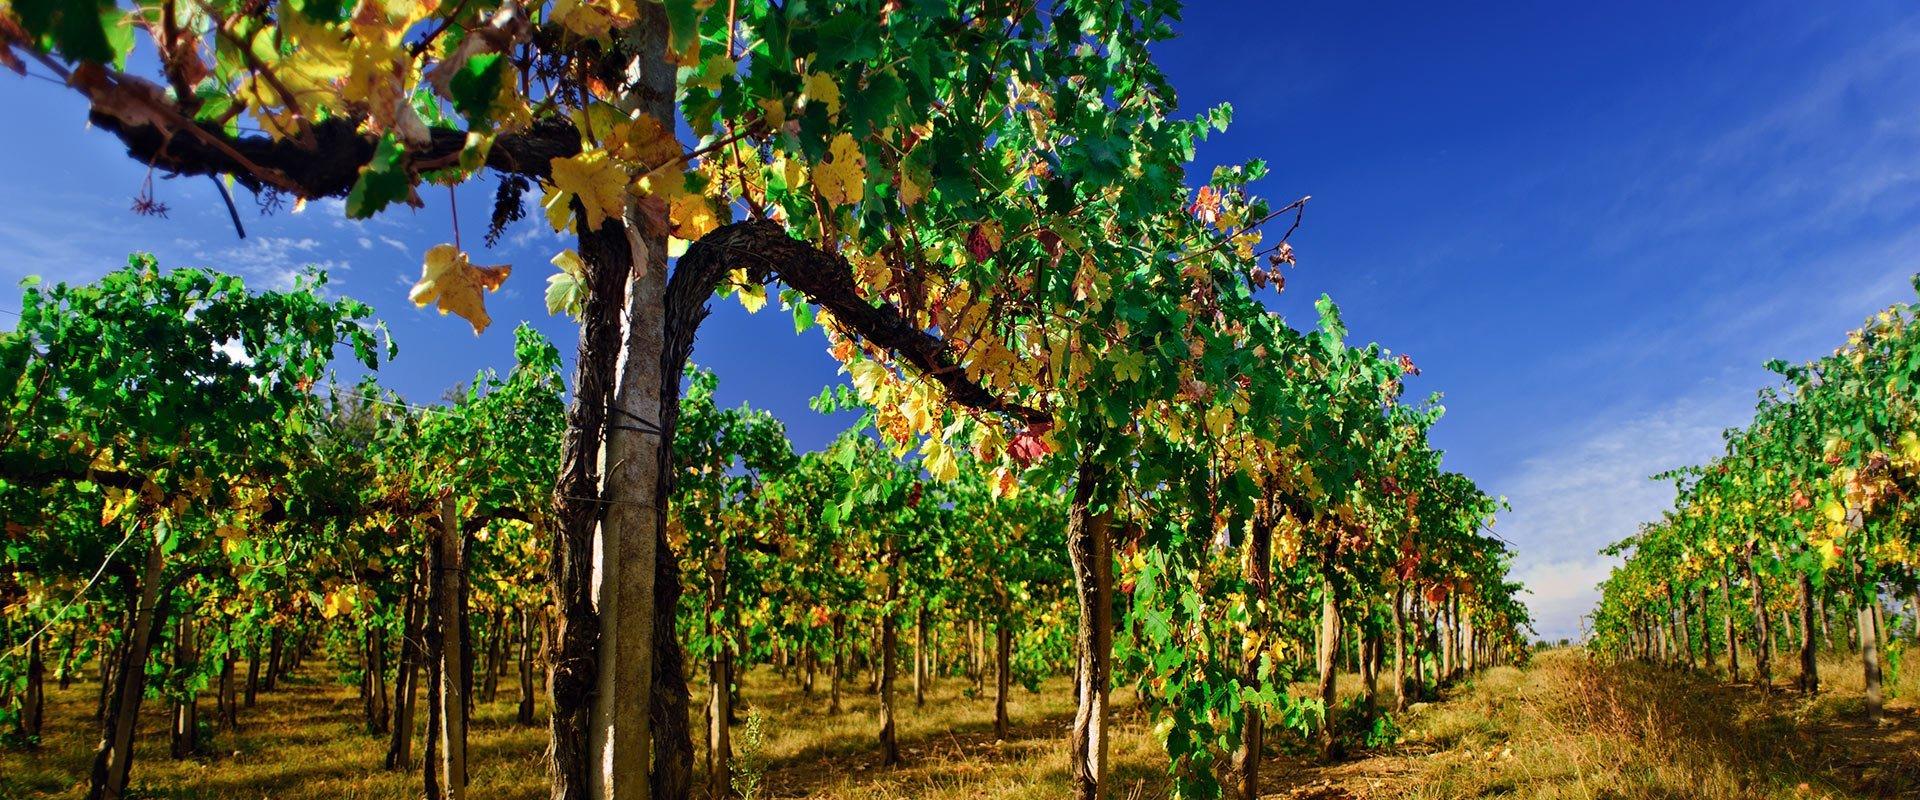 daios hotel wine road